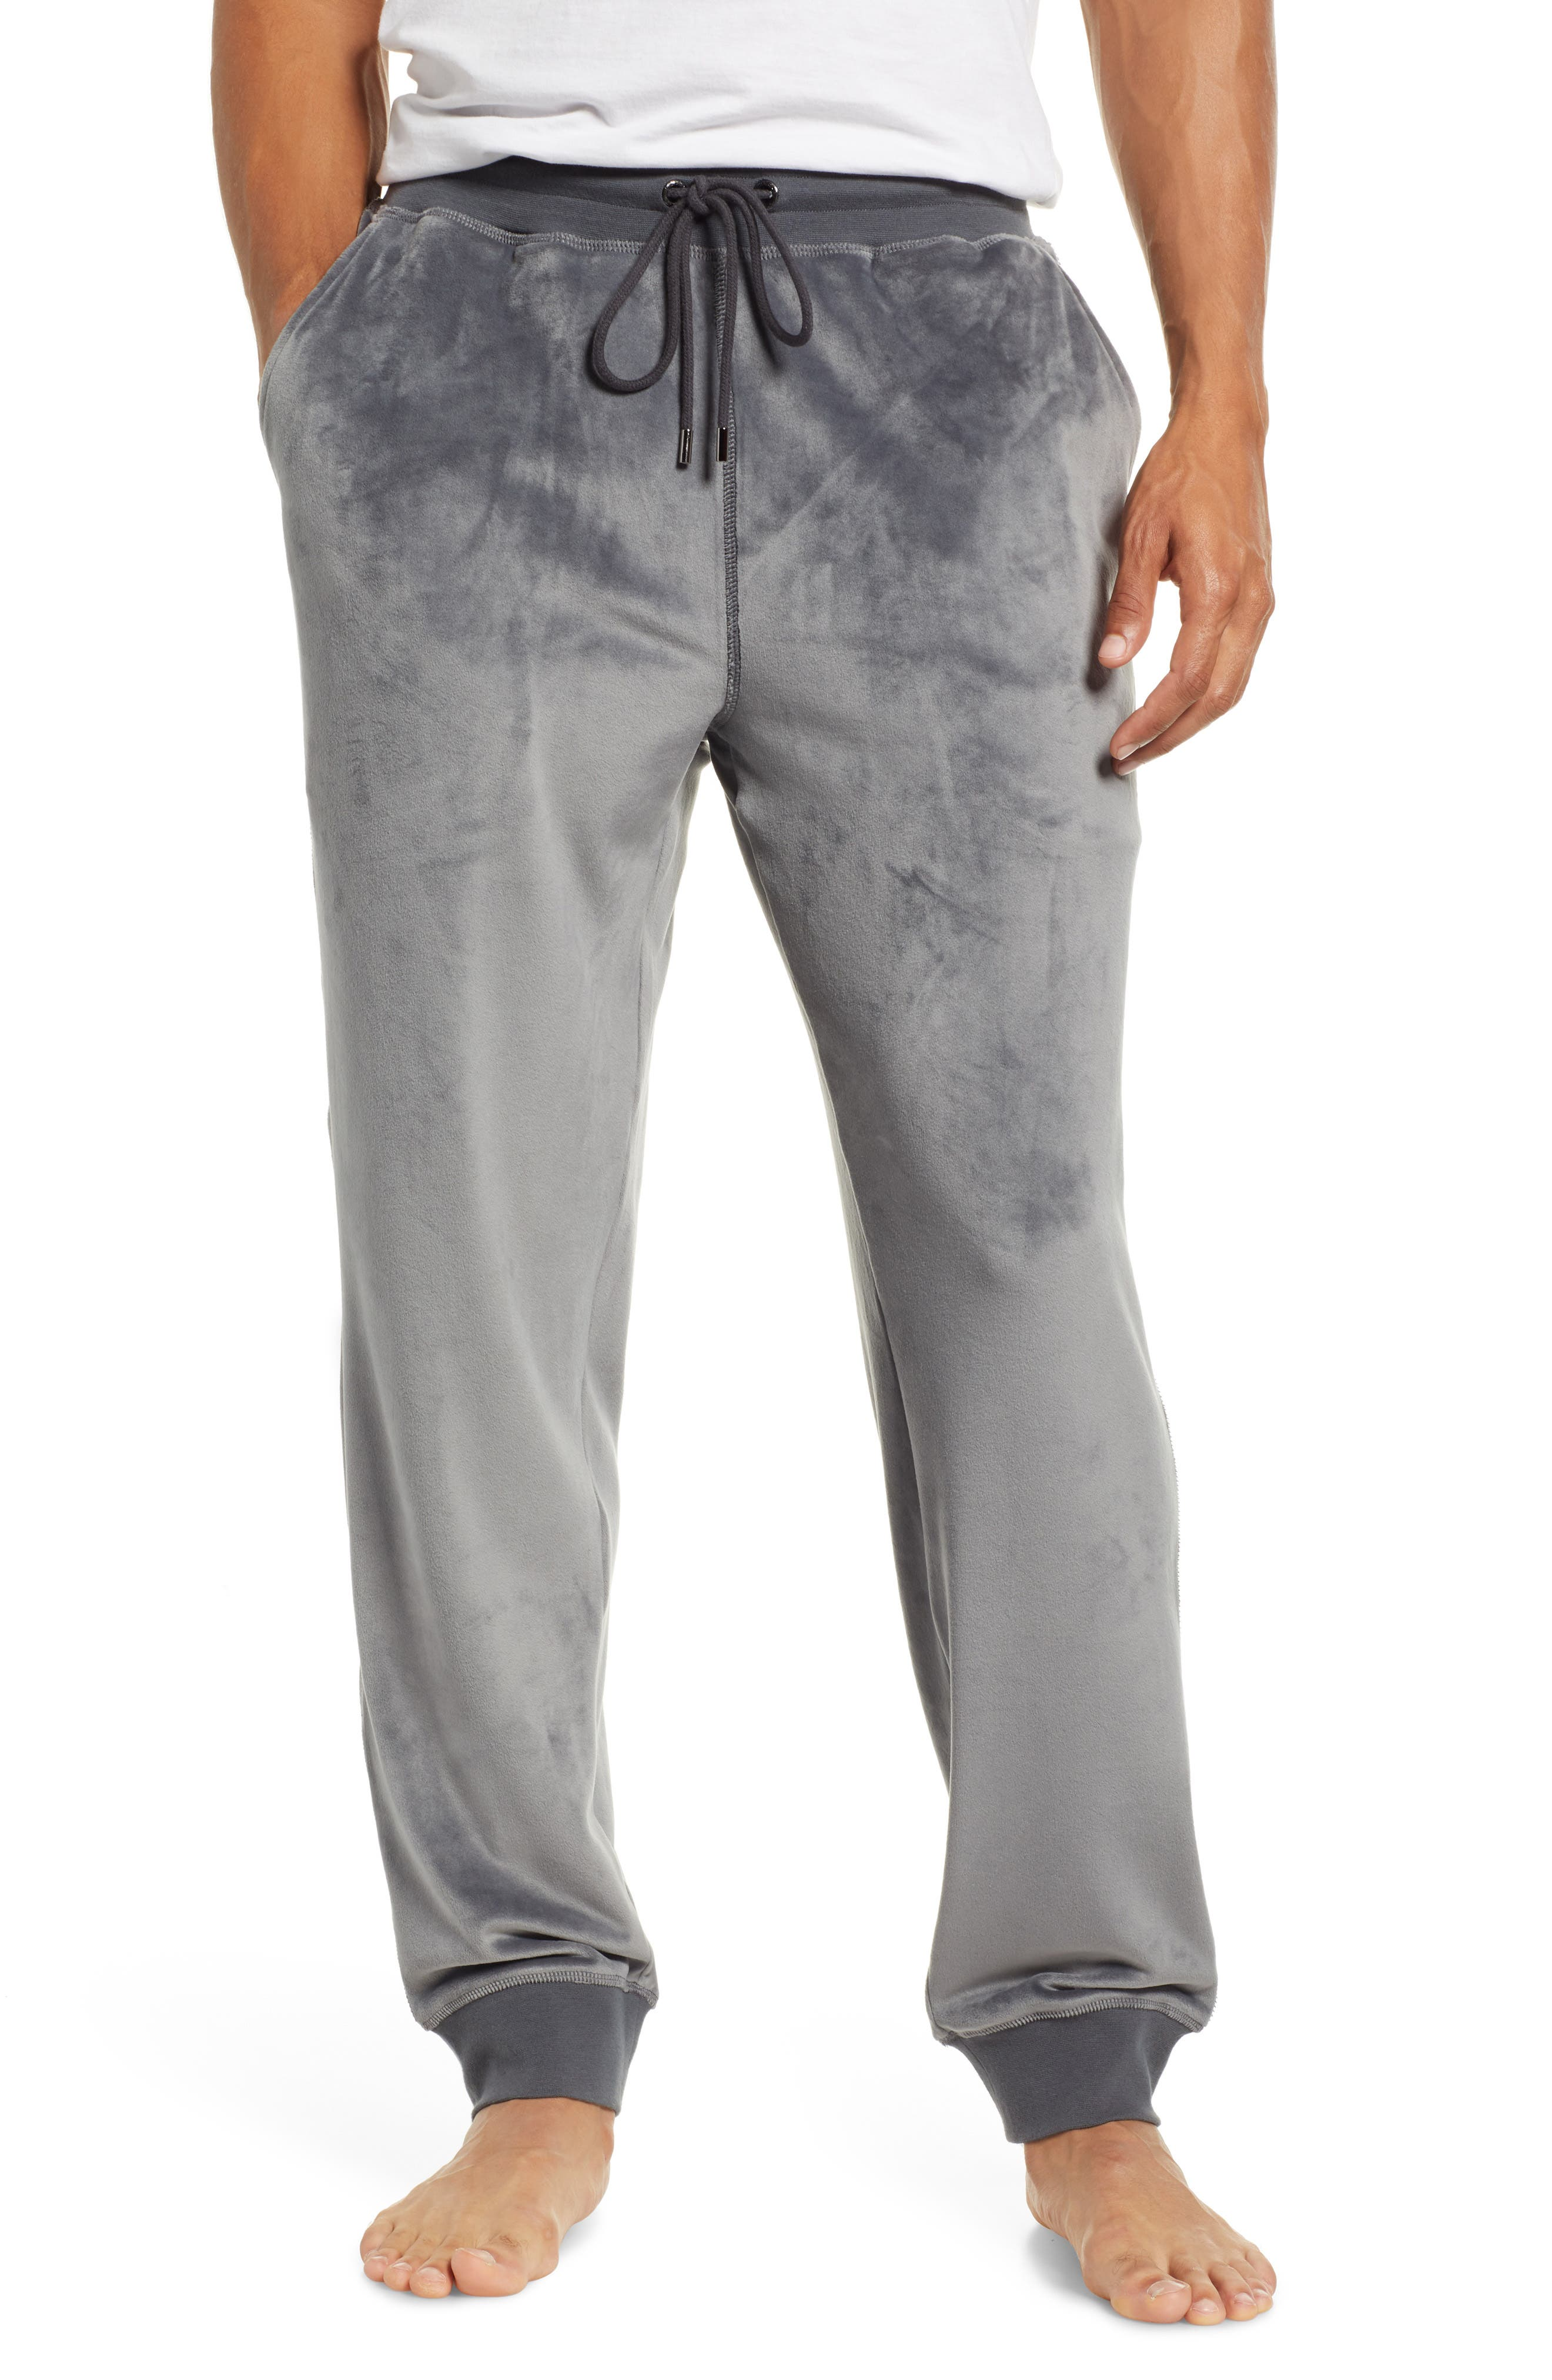 Velour Lounge Pants,                             Main thumbnail 1, color,                             GREY